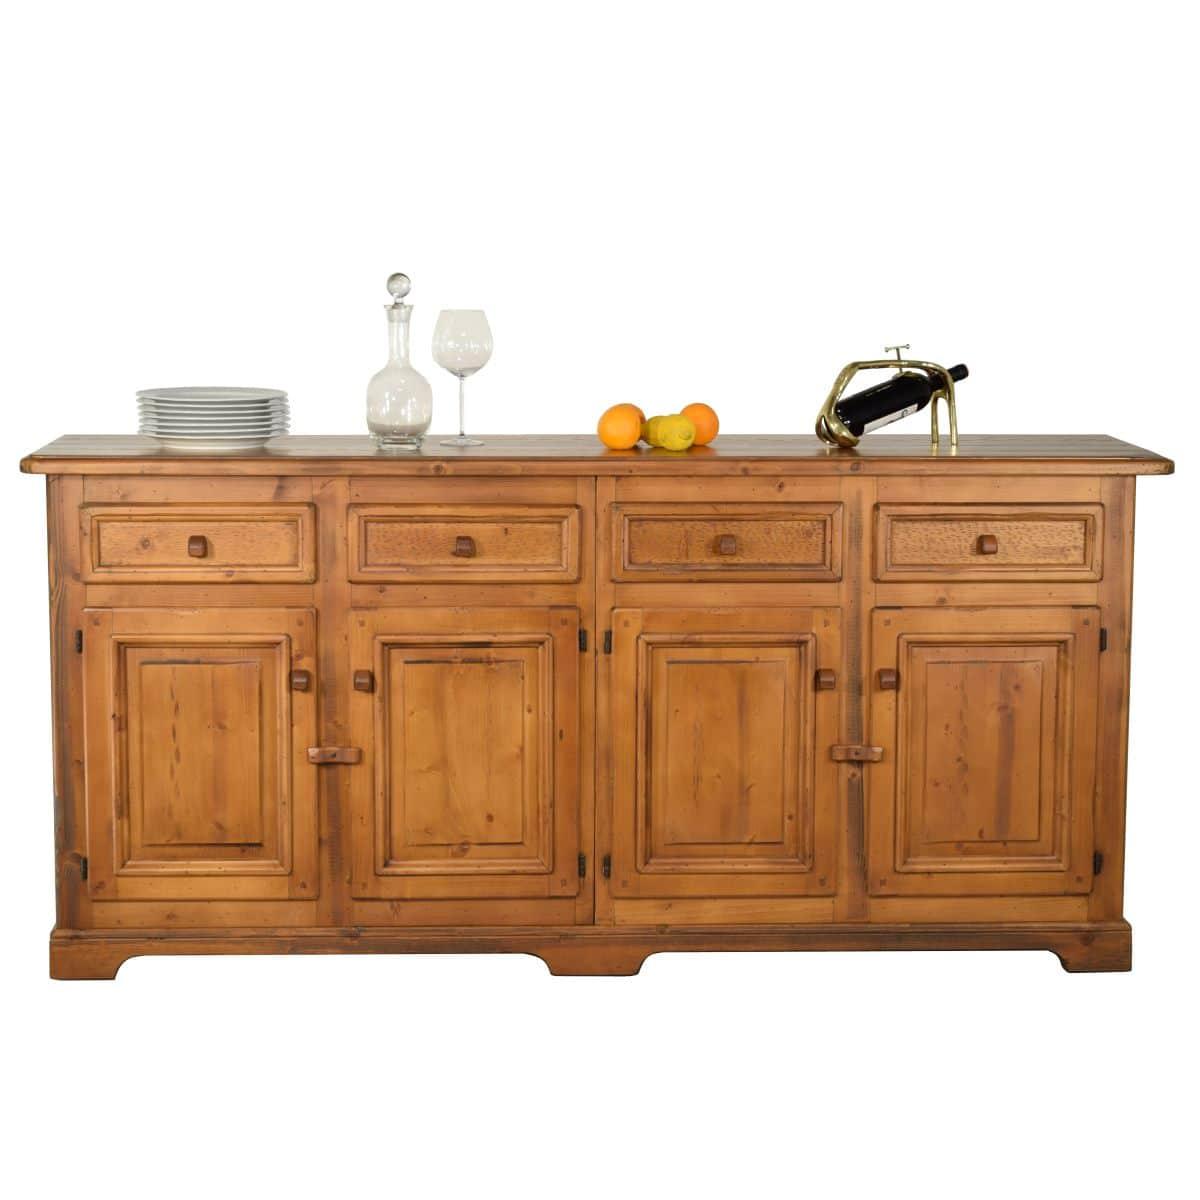 Armario Multiuso Retro ~ Aparador rústico de madera 207cm largo Ecorústico venta de muebles